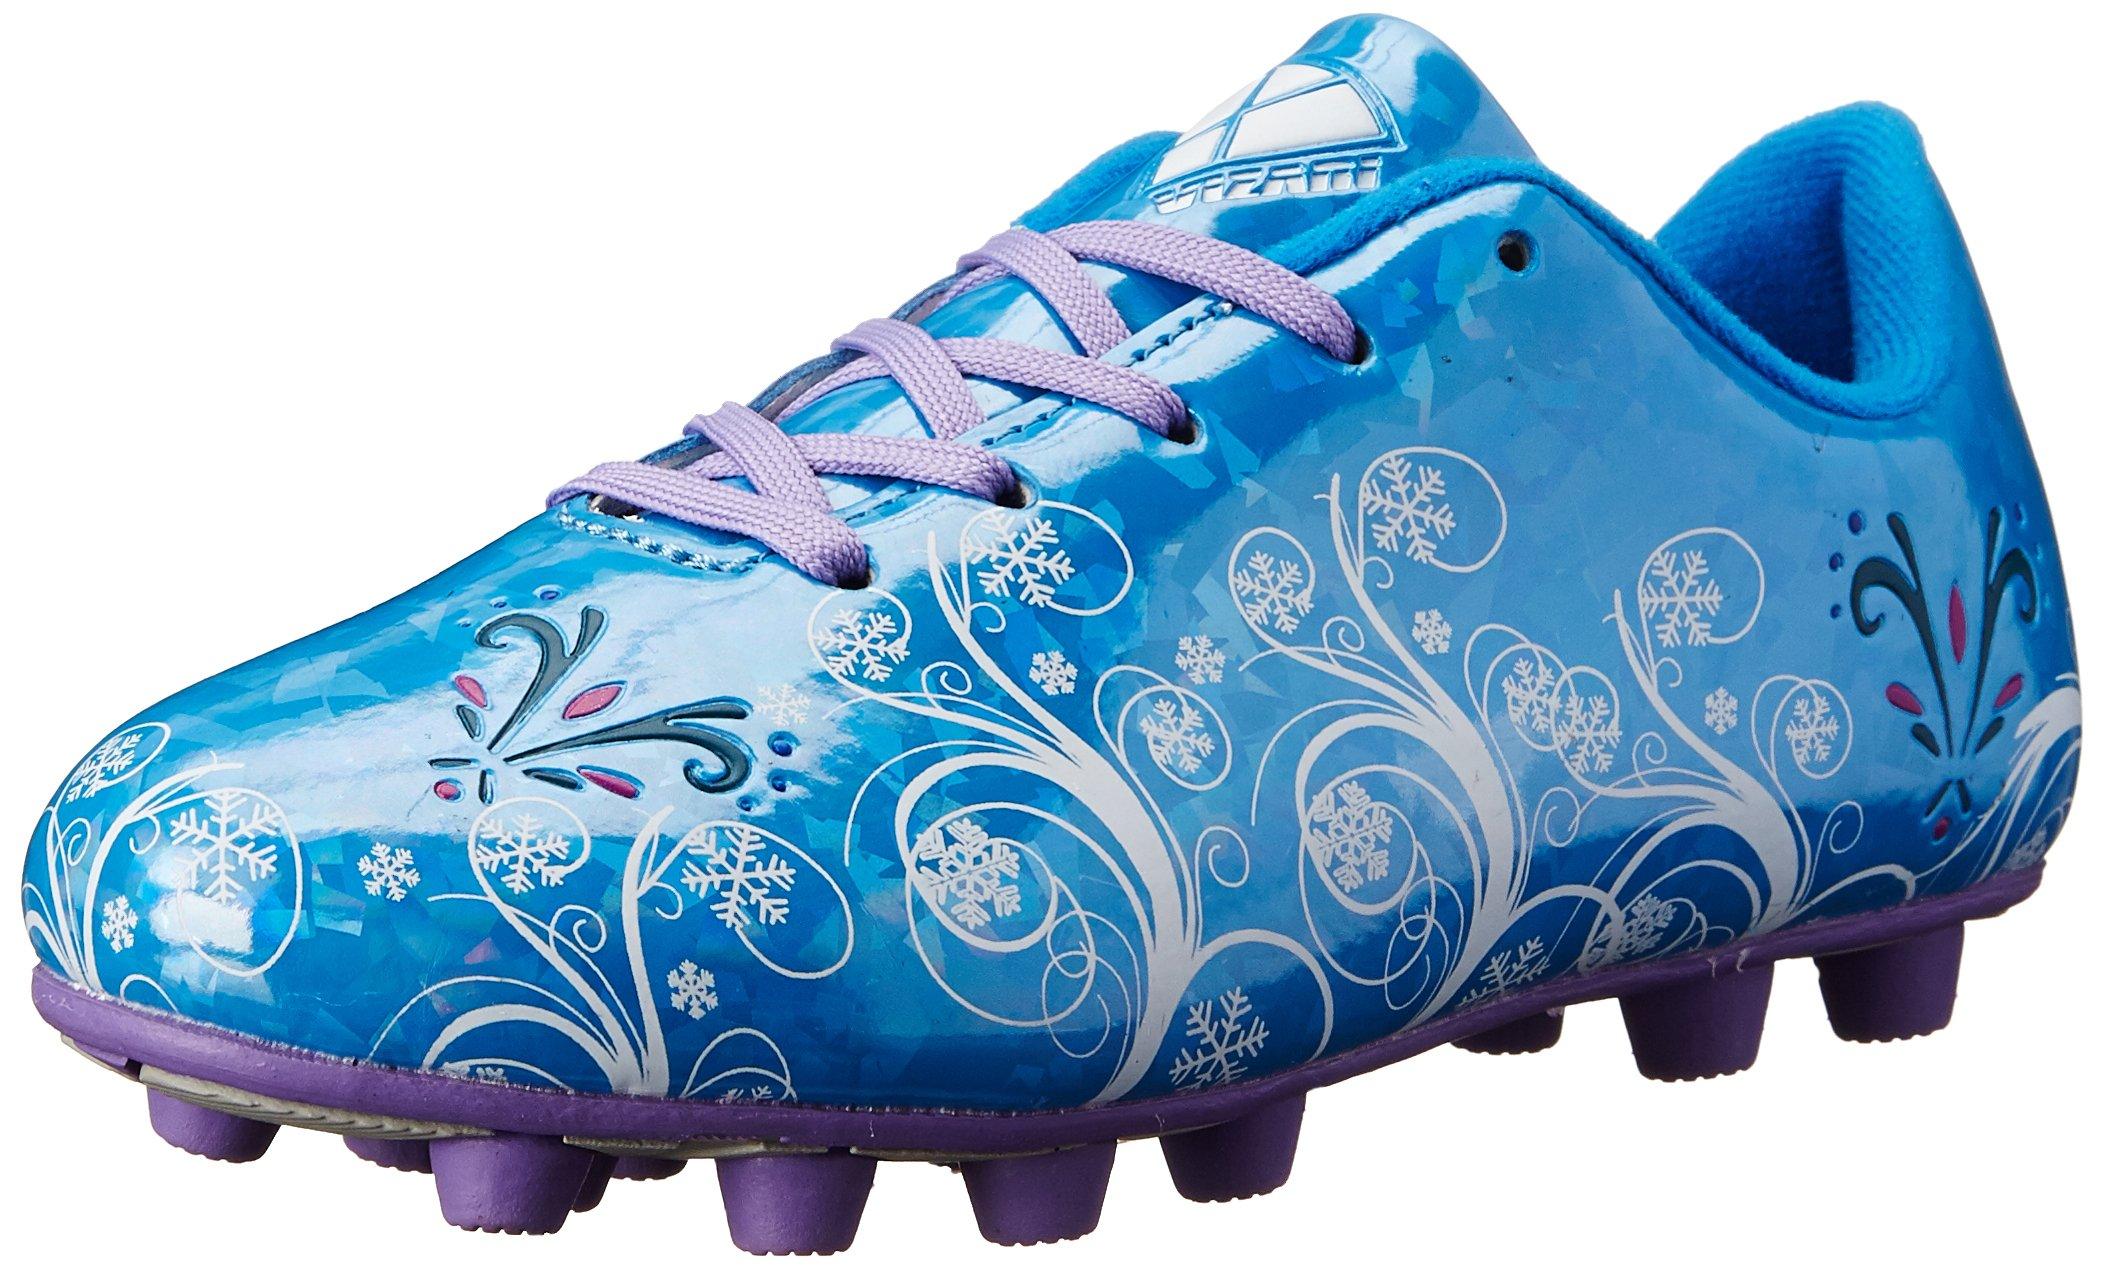 Vizari Frost FG 93279-13 Soccer Cleat Blue/Purple, 13 M US Toddler